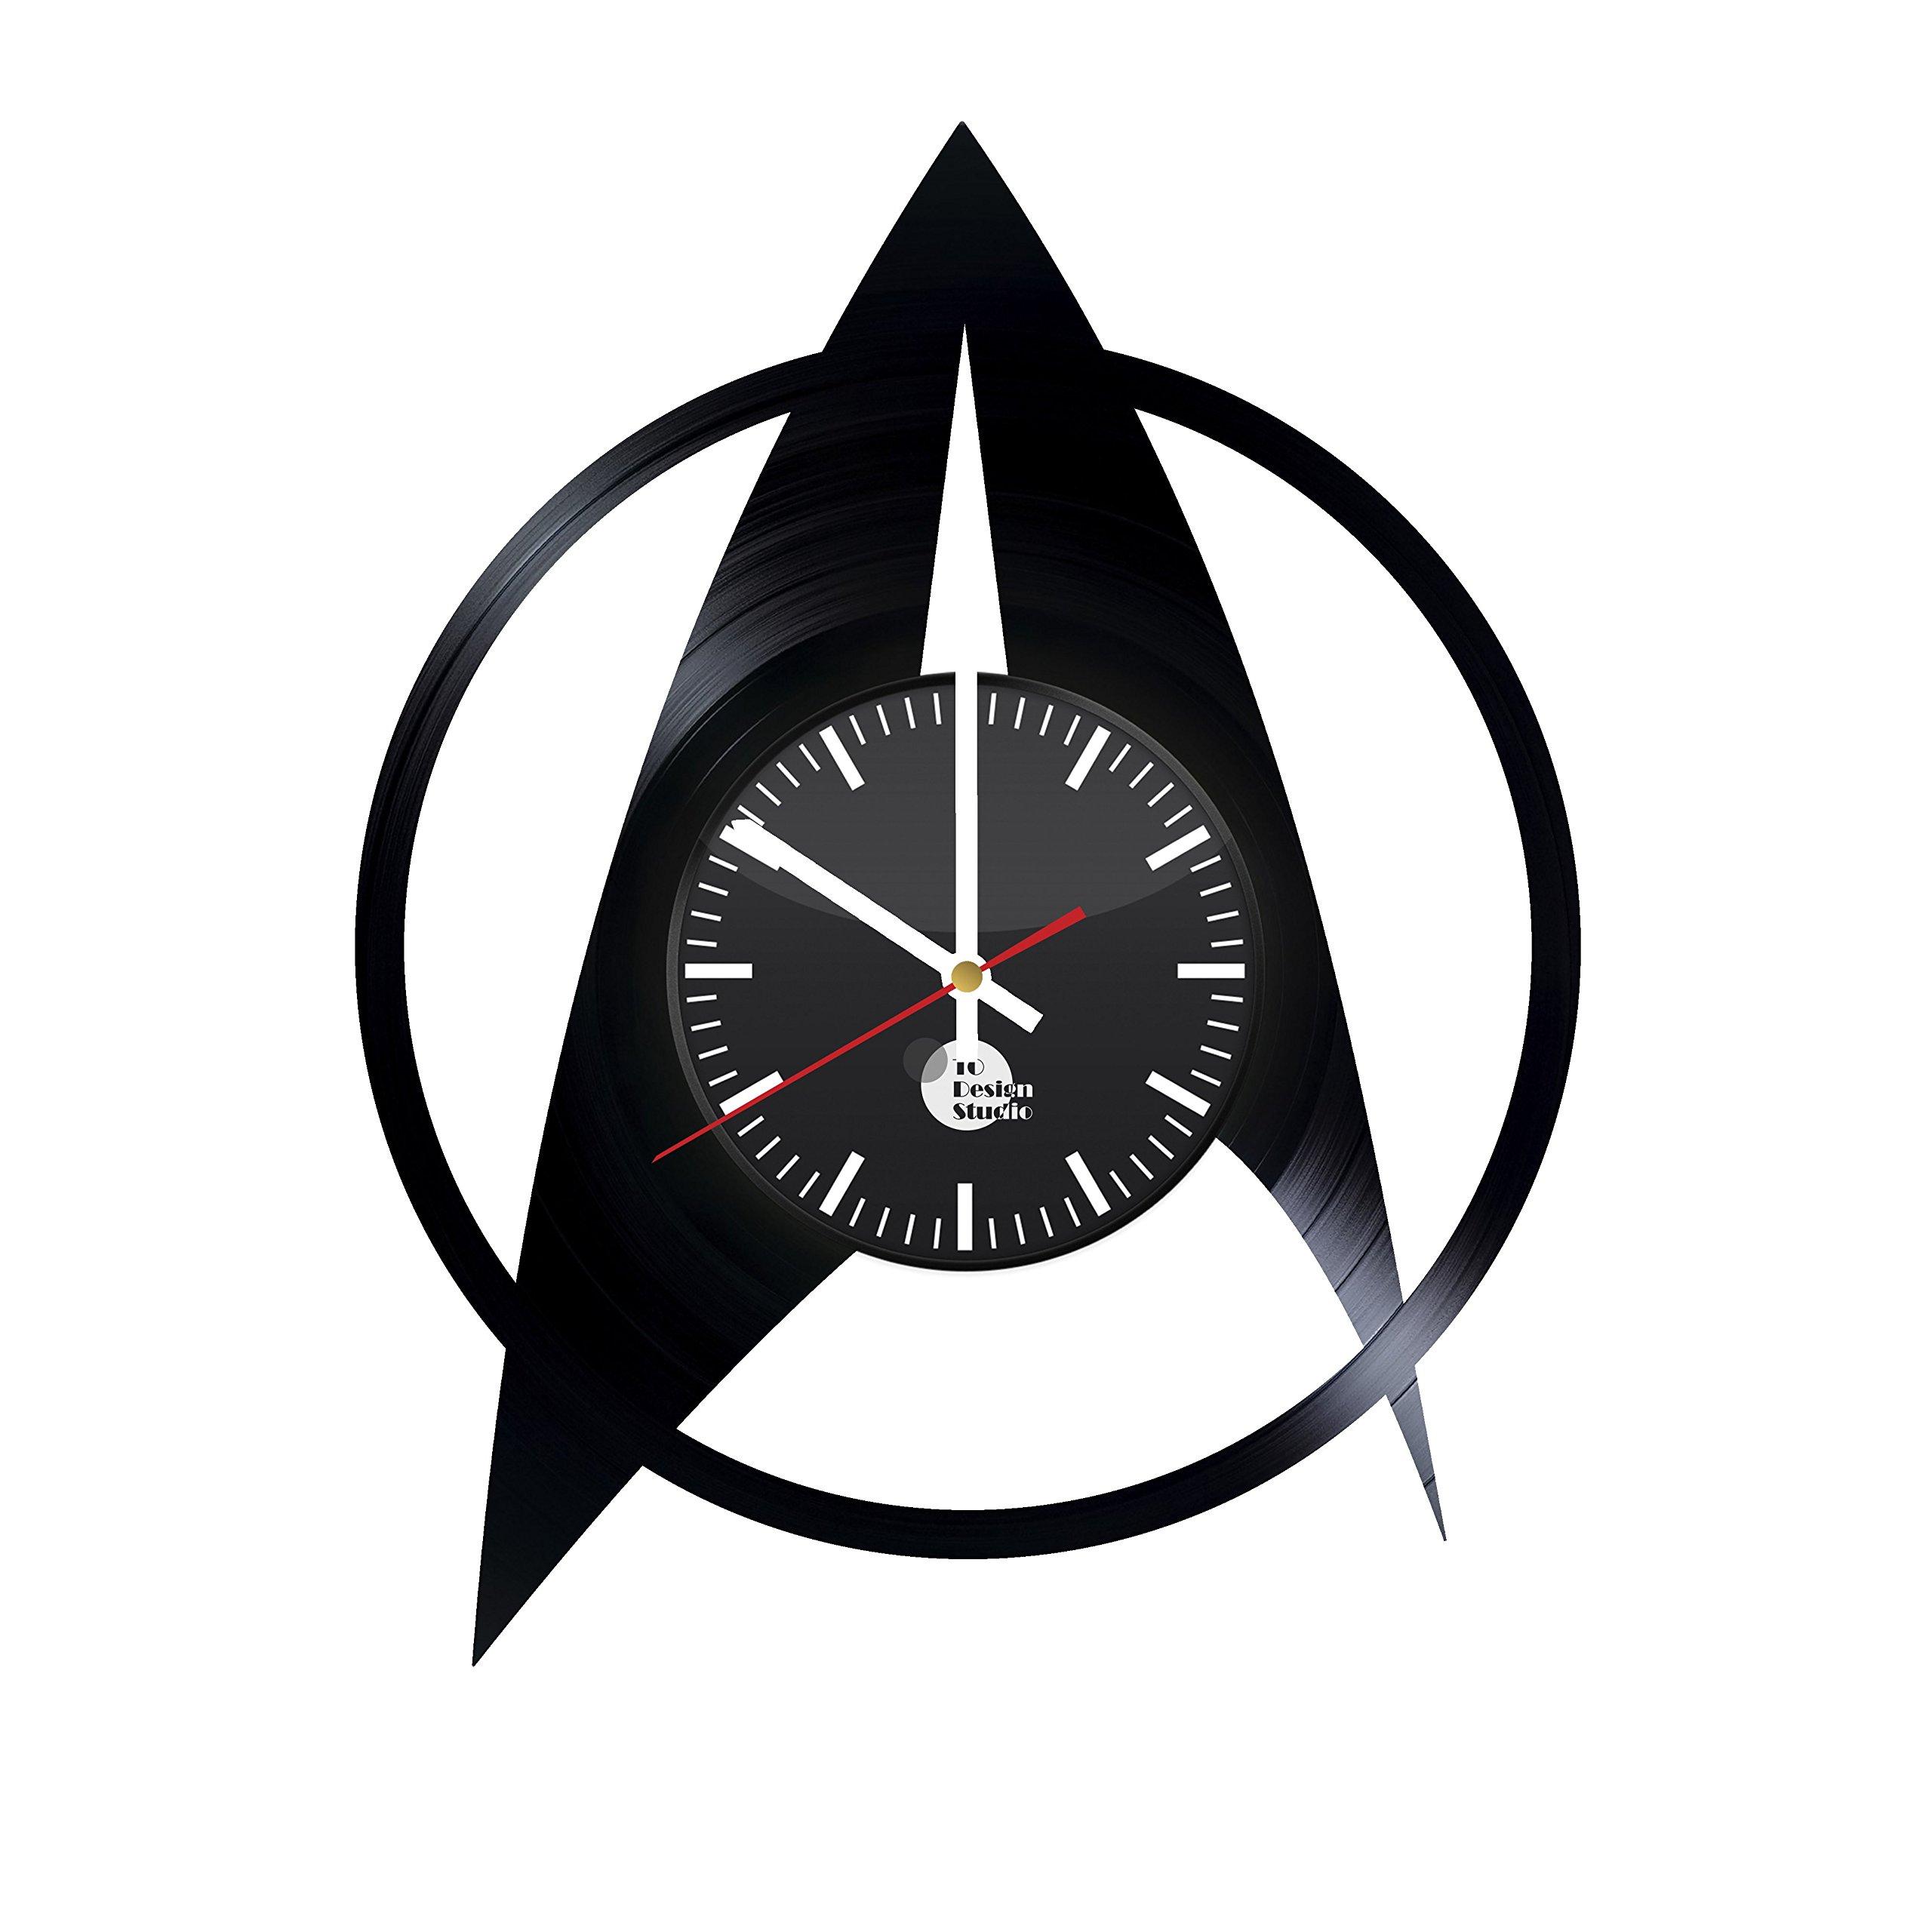 Star Trek Vinyl Record Wall Clock - Get unique garage, kids, bed room wall décor - Gift ideas for men, women, children – Unique movie art design - Leave us a feedback and win your custom clock.